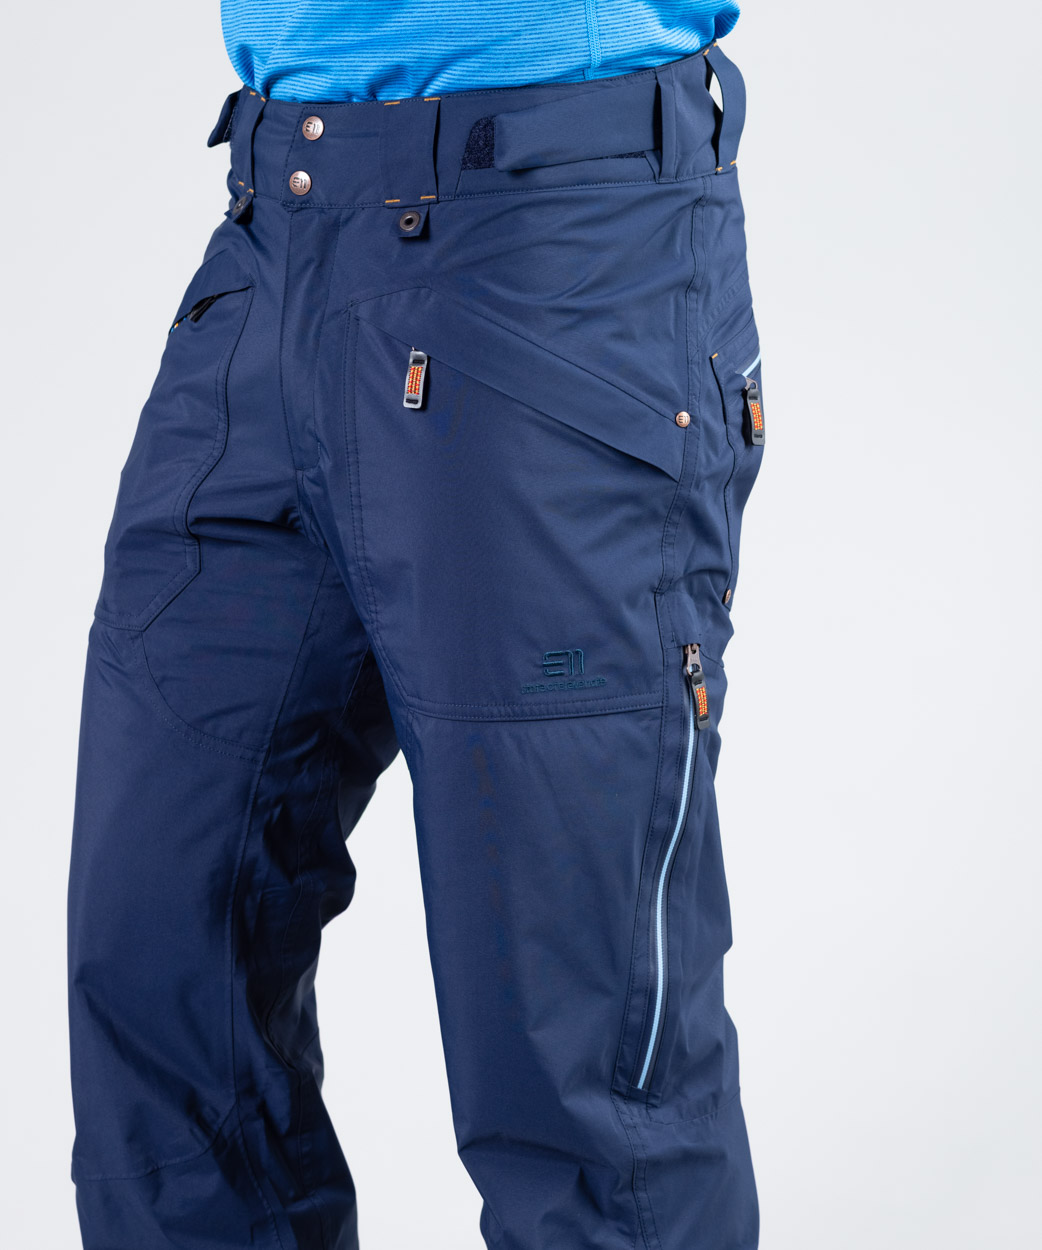 Men's Creblet Insulated Ski Pant